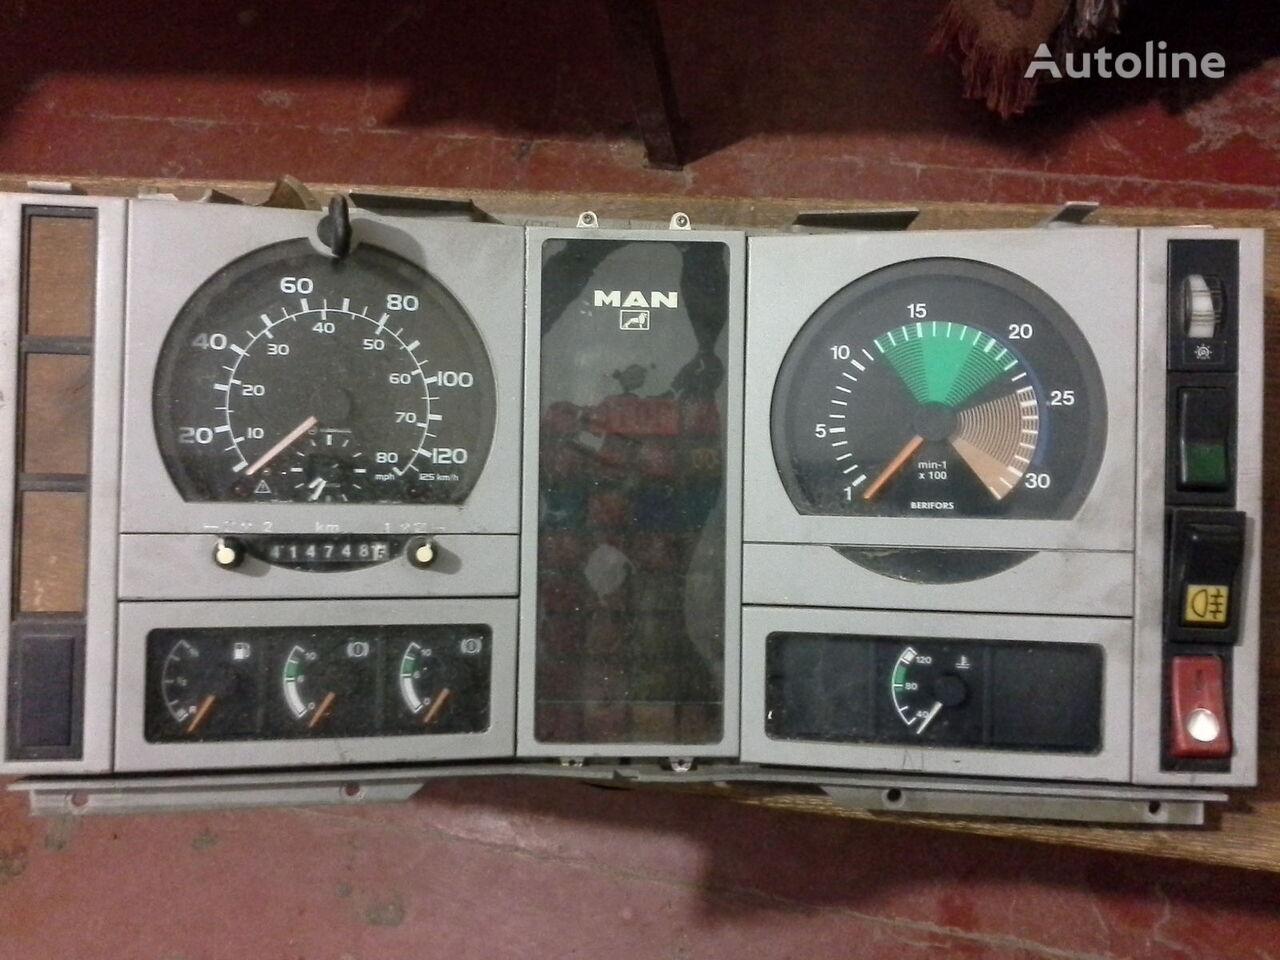 tahograf  Spidometr  Tahometr originalni zapchasti kabini za kamiona MAN  L2000 Po zapchastyam